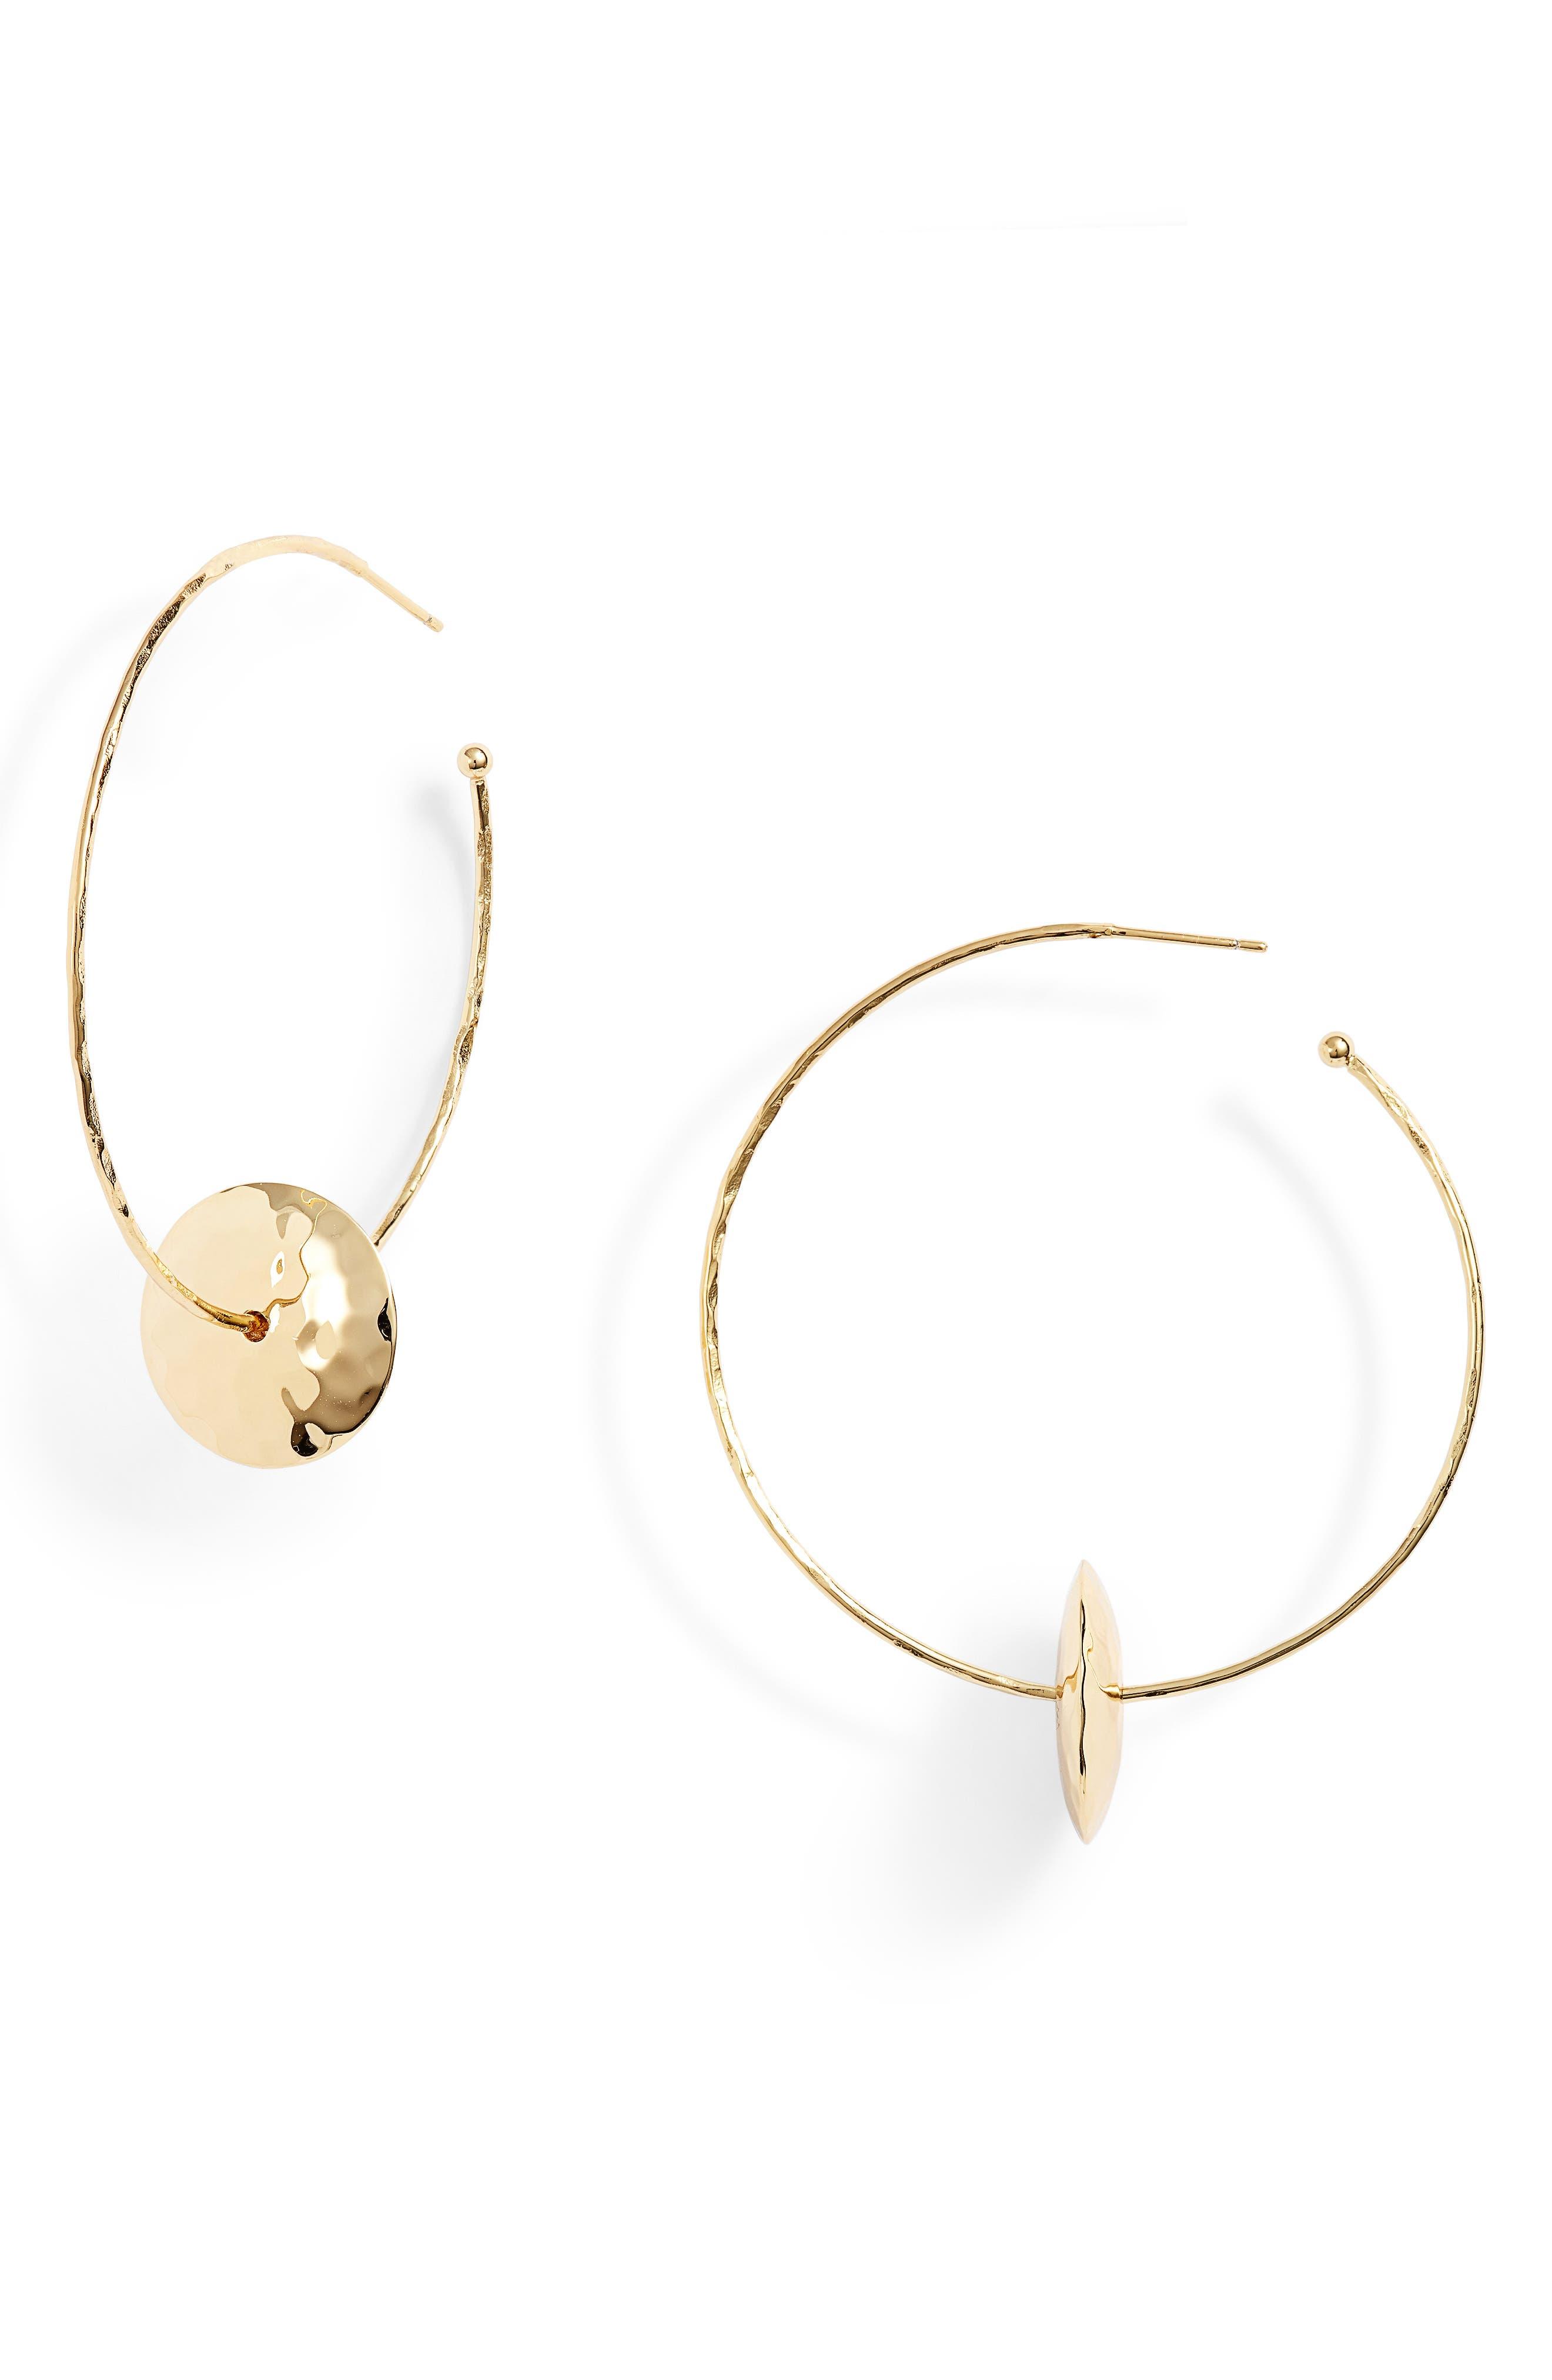 Marlow Hammered Disc Hoop Earrings,                         Main,                         color, Gold